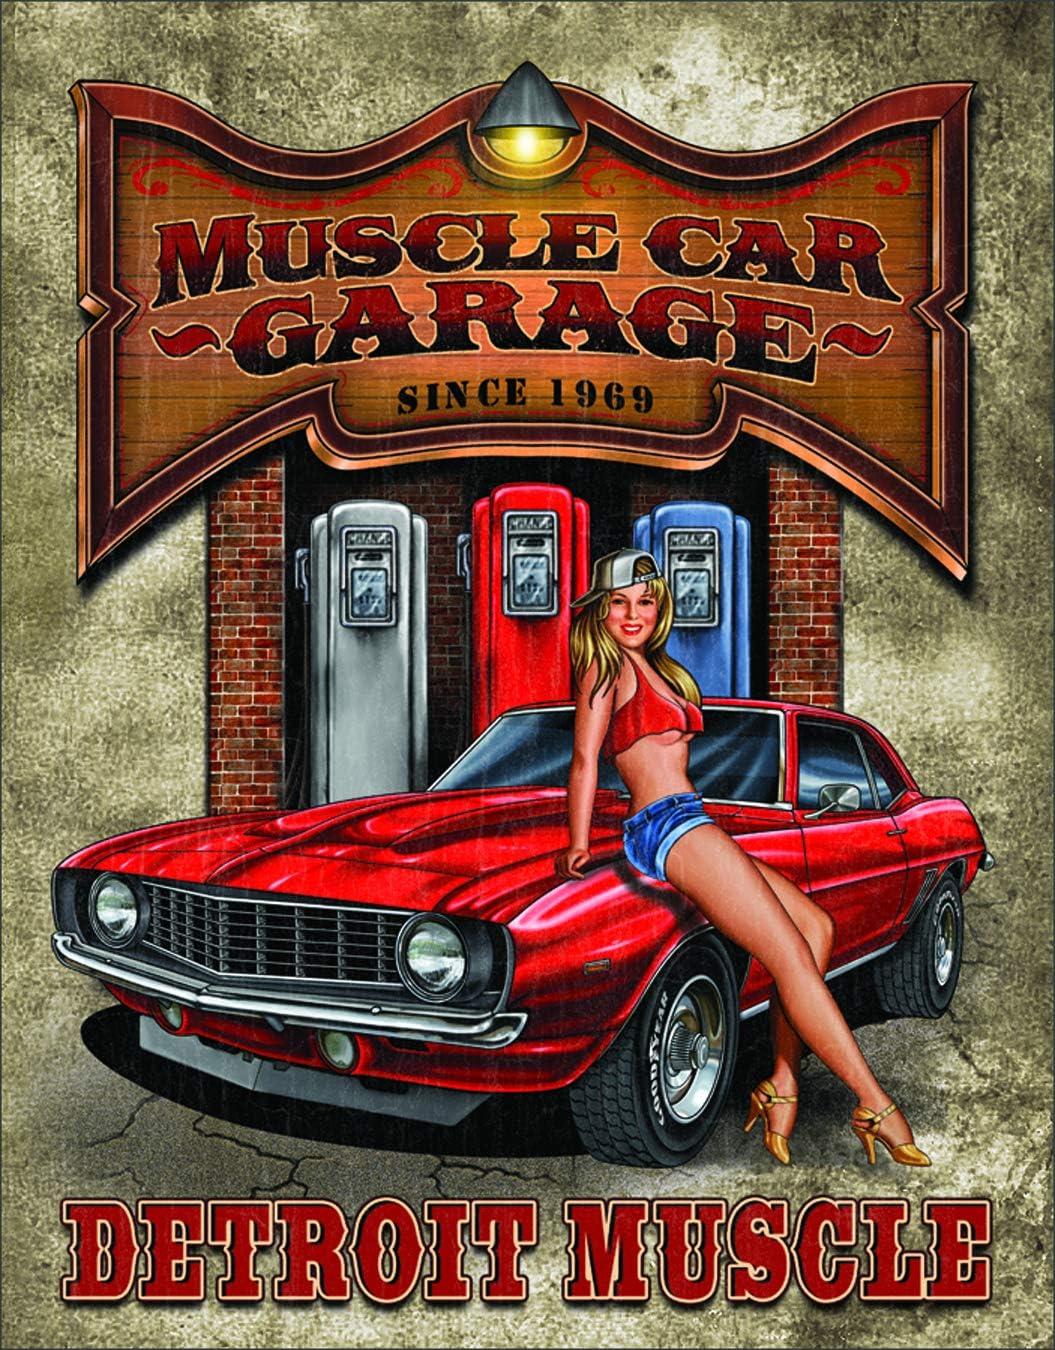 Legends - Muscle Car Garage Tin Sign